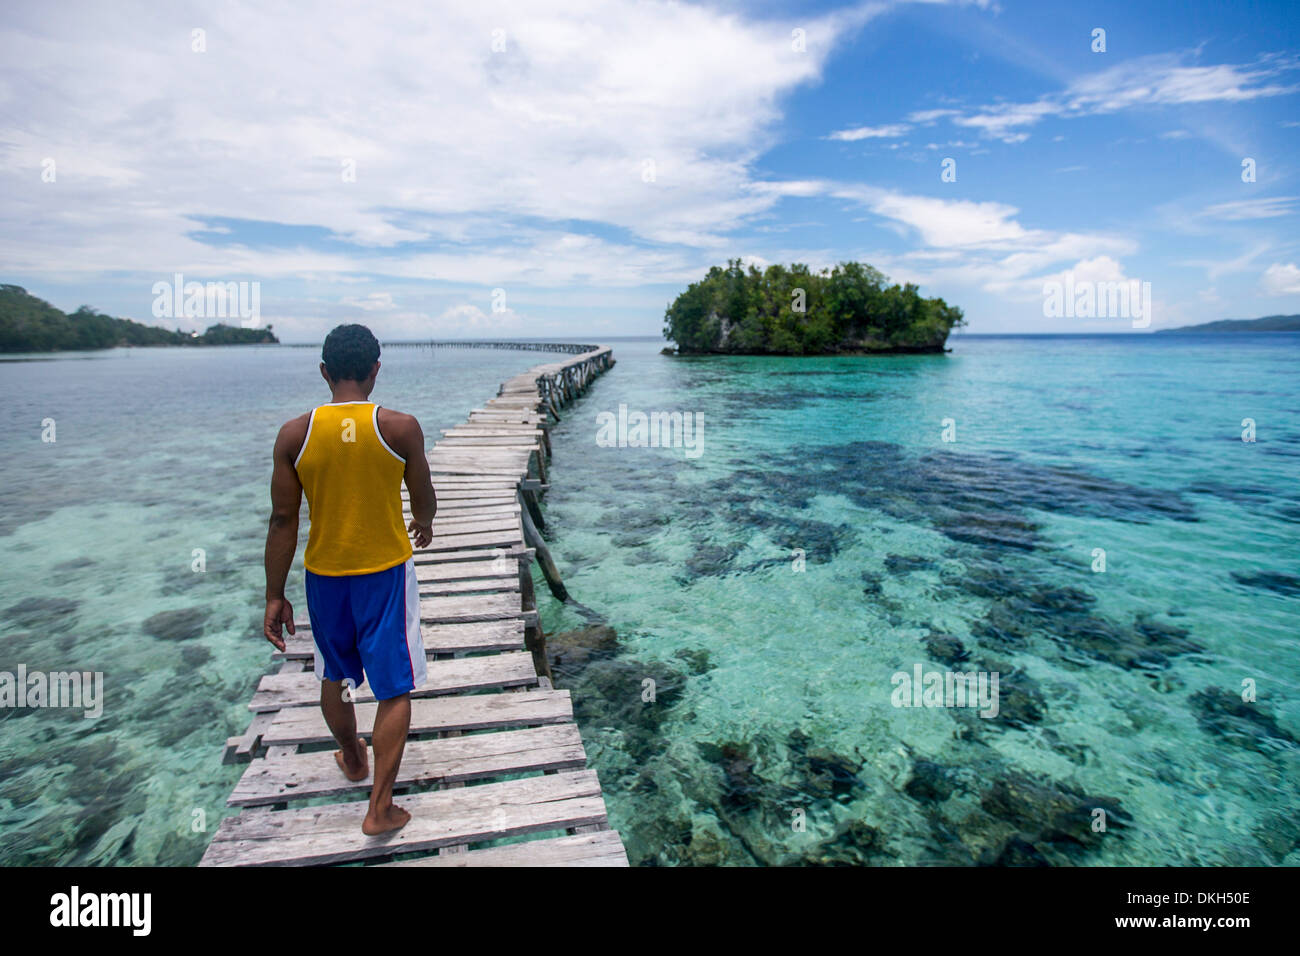 Long bridge, Togian Islands, Sulawesi, Indonesia, Southeast Asia, Asia - Stock Image